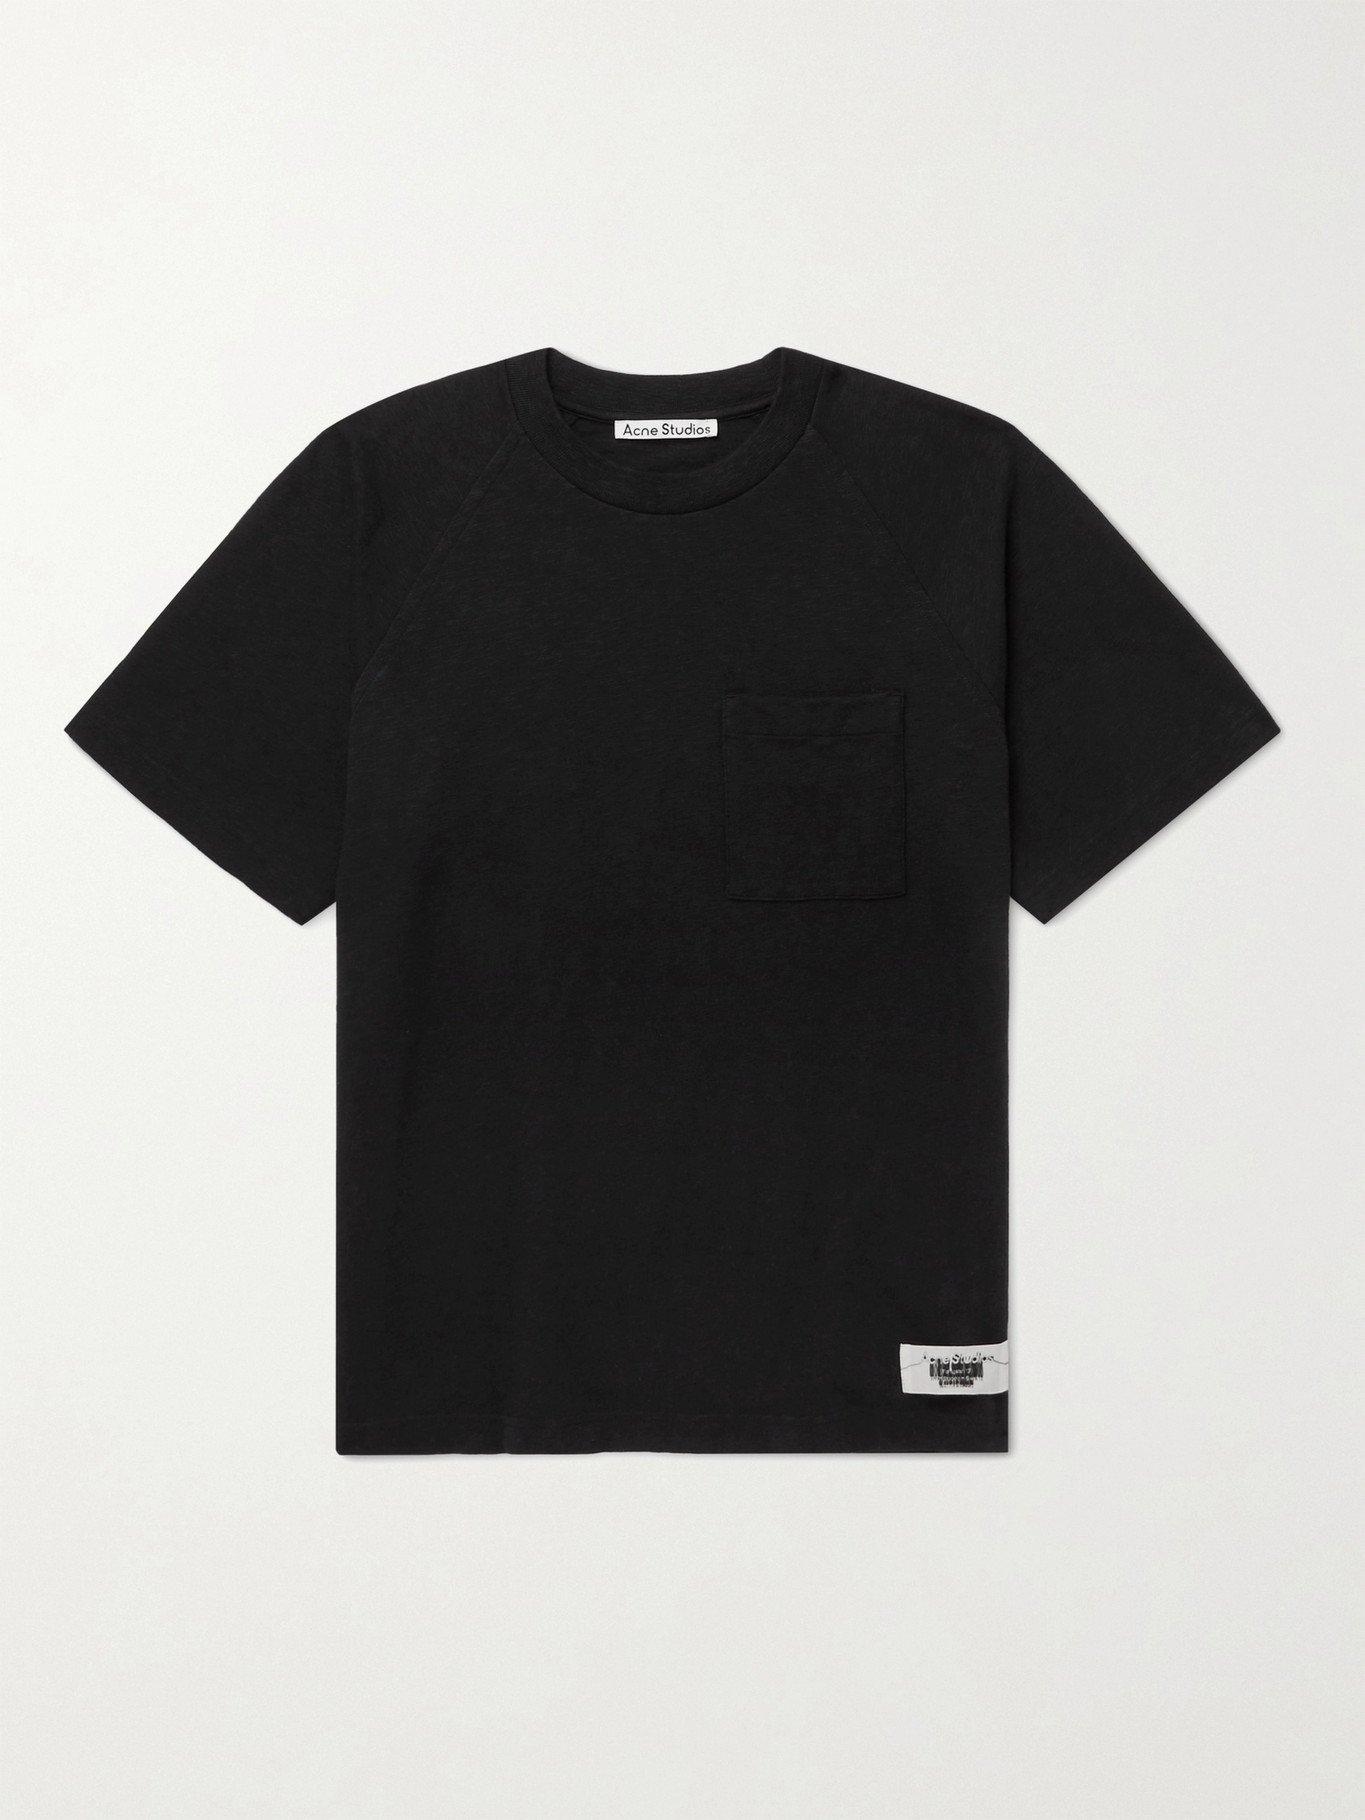 Photo: ACNE STUDIOS - Emeril Slub Cotton-Jersey T-Shirt - Black